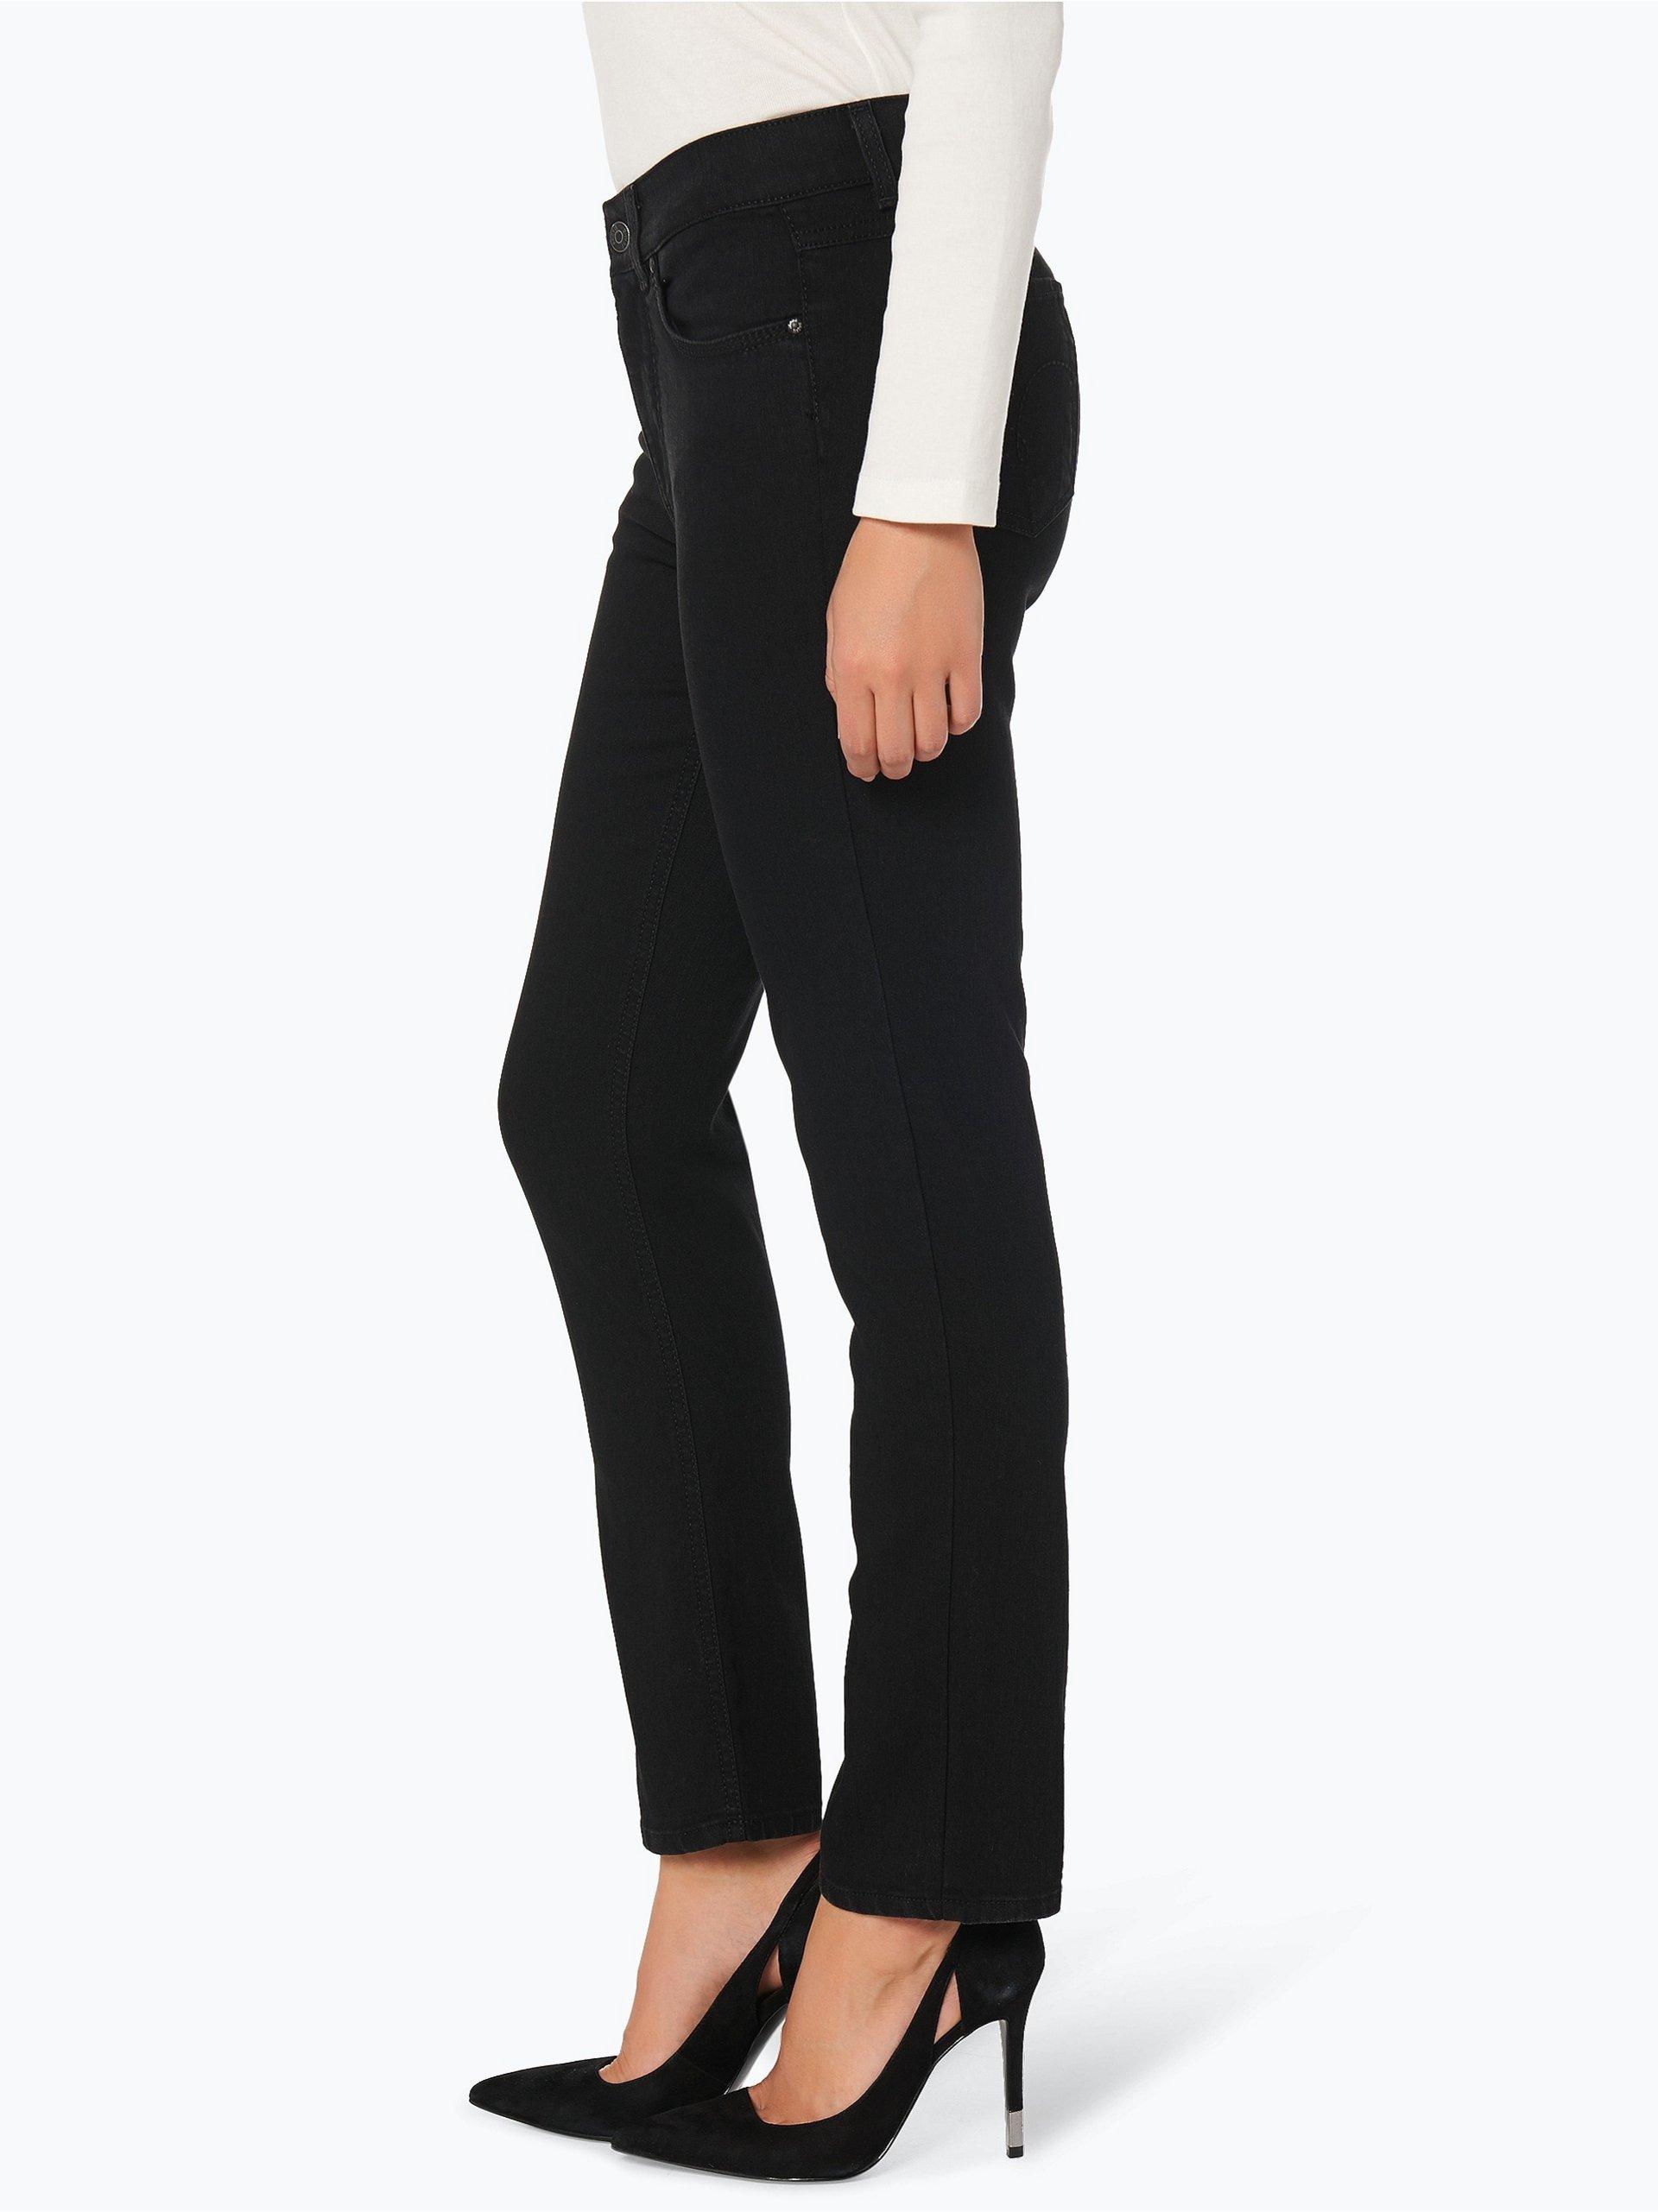 angels damen jeans cici kurzgr e online kaufen. Black Bedroom Furniture Sets. Home Design Ideas